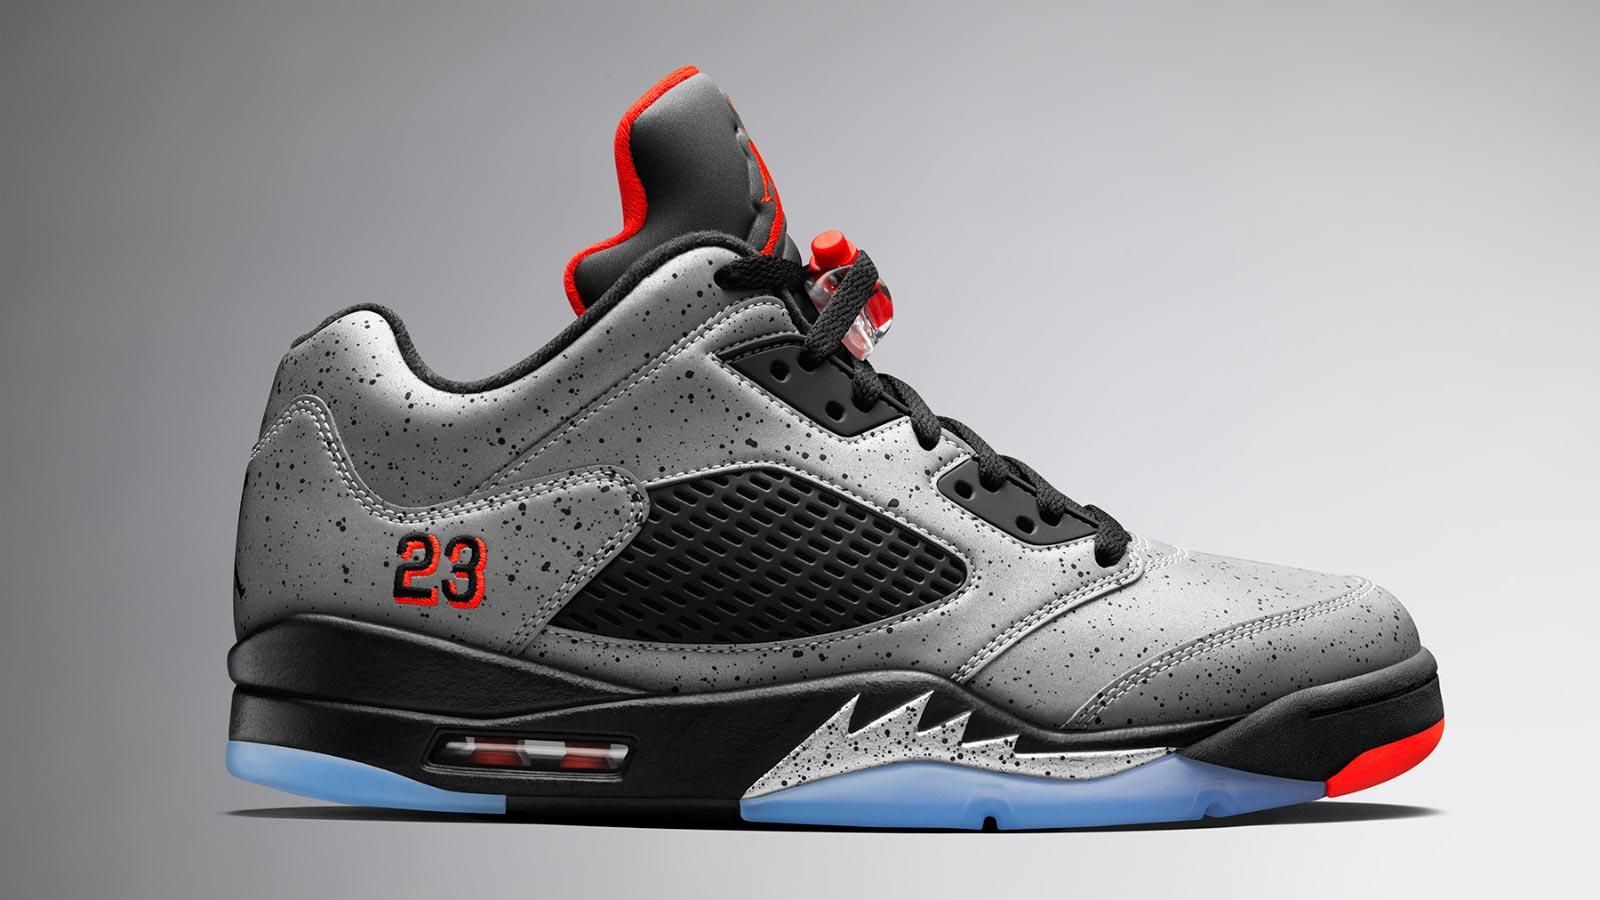 Jordans Shoes Not Used